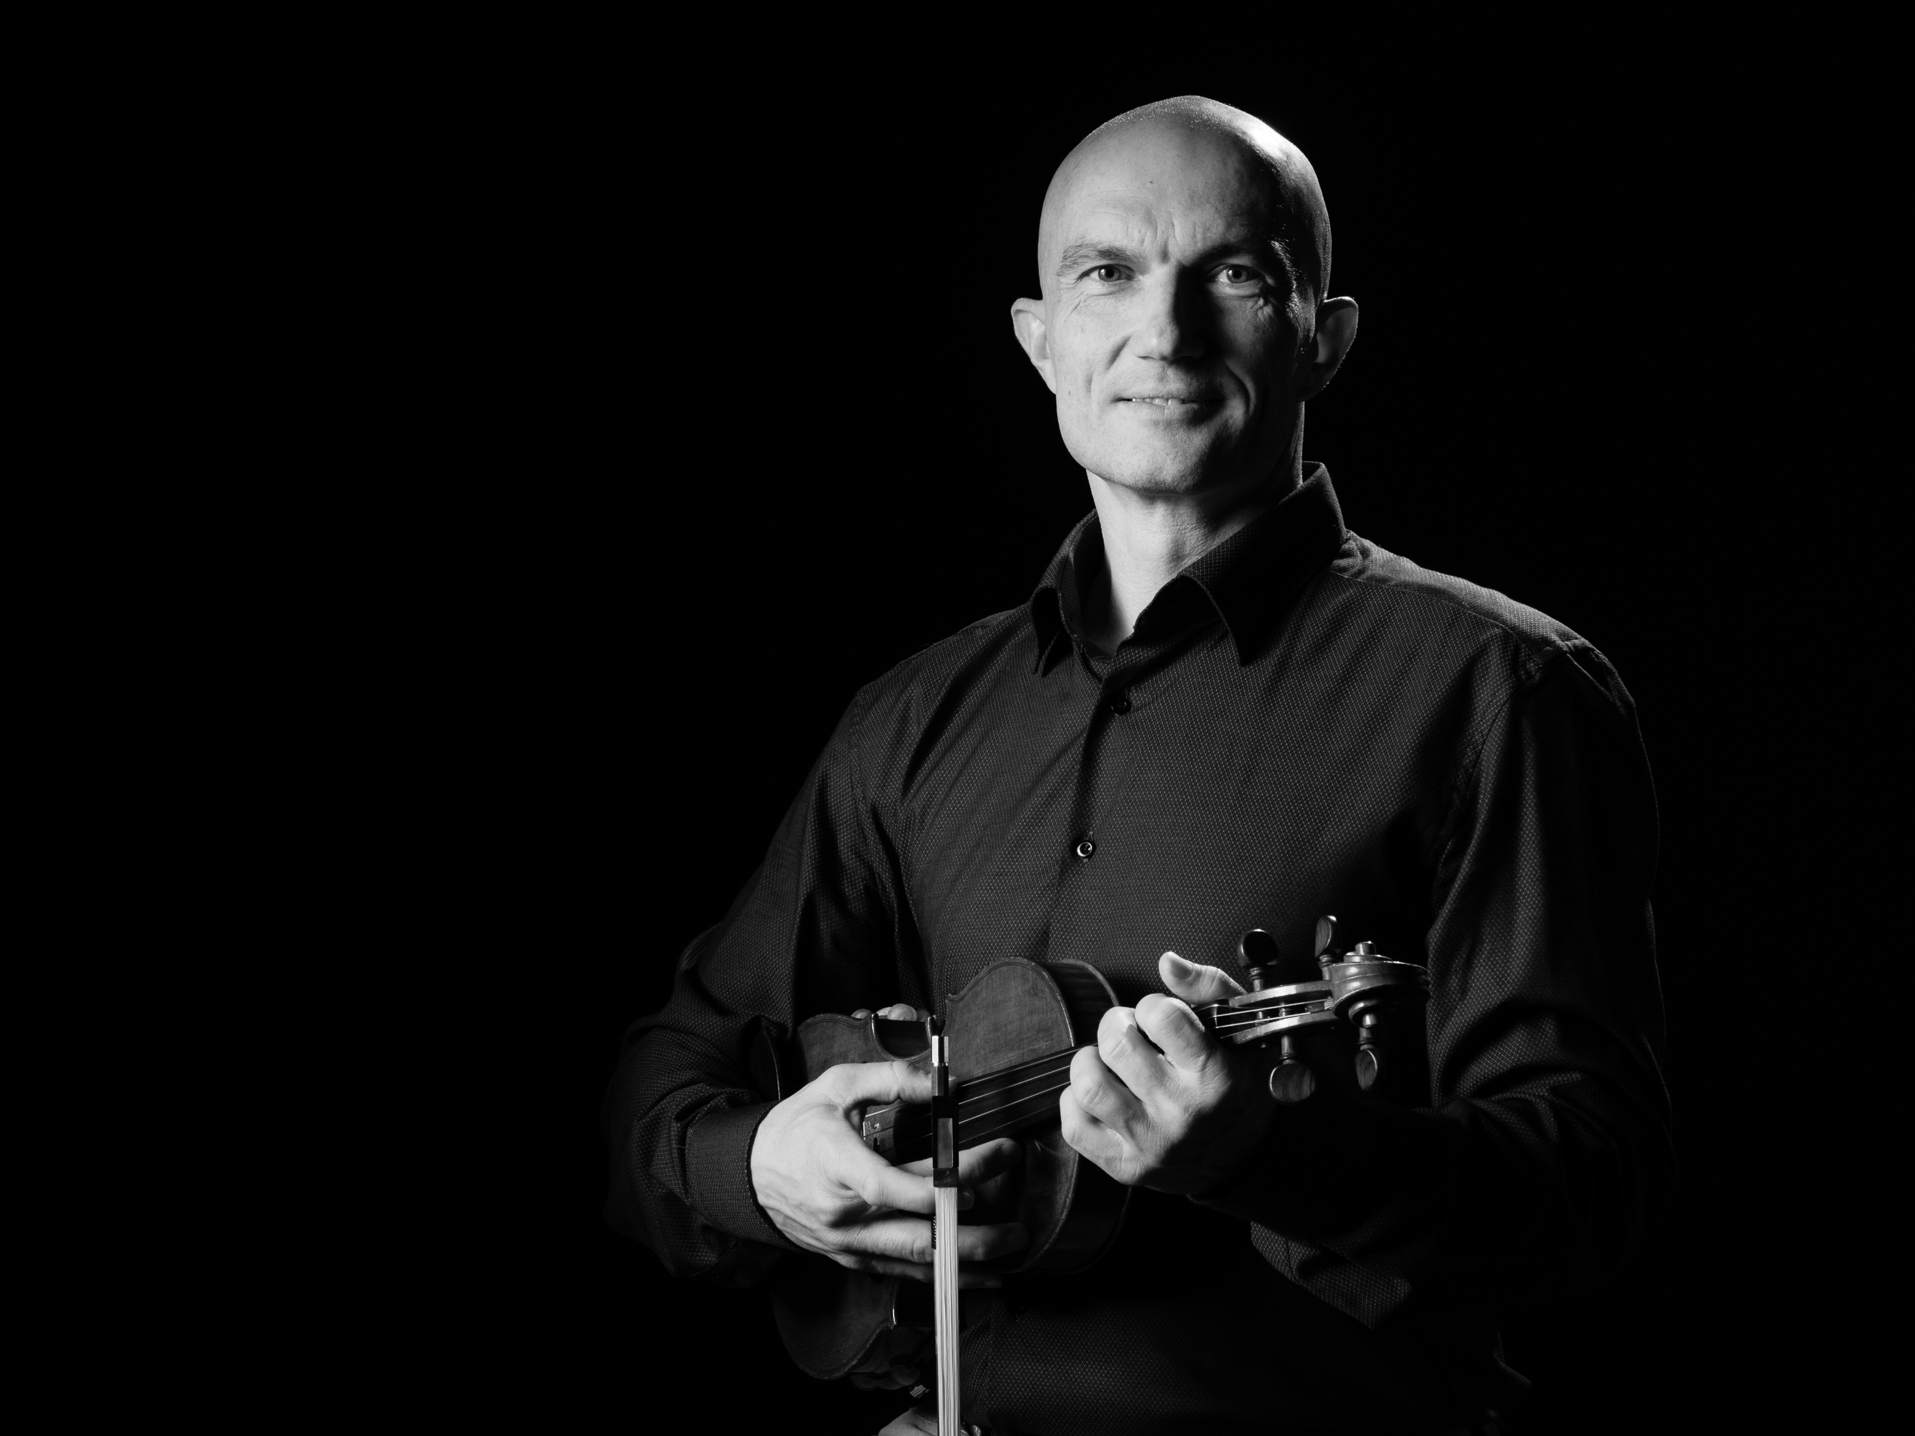 Portrait des Musikers Miroslav Großer